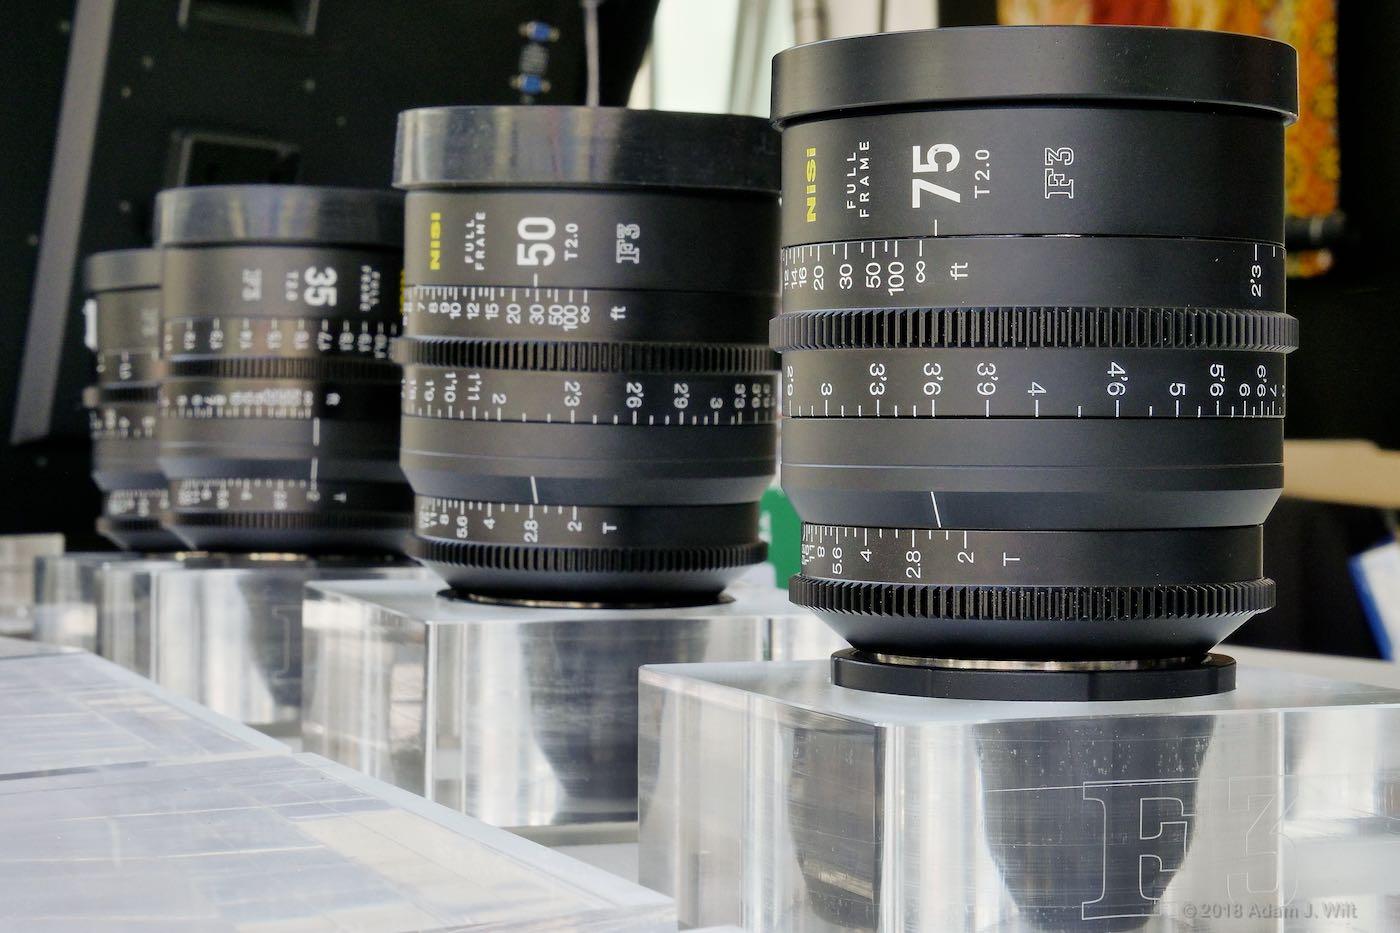 NiSi F3 lenses